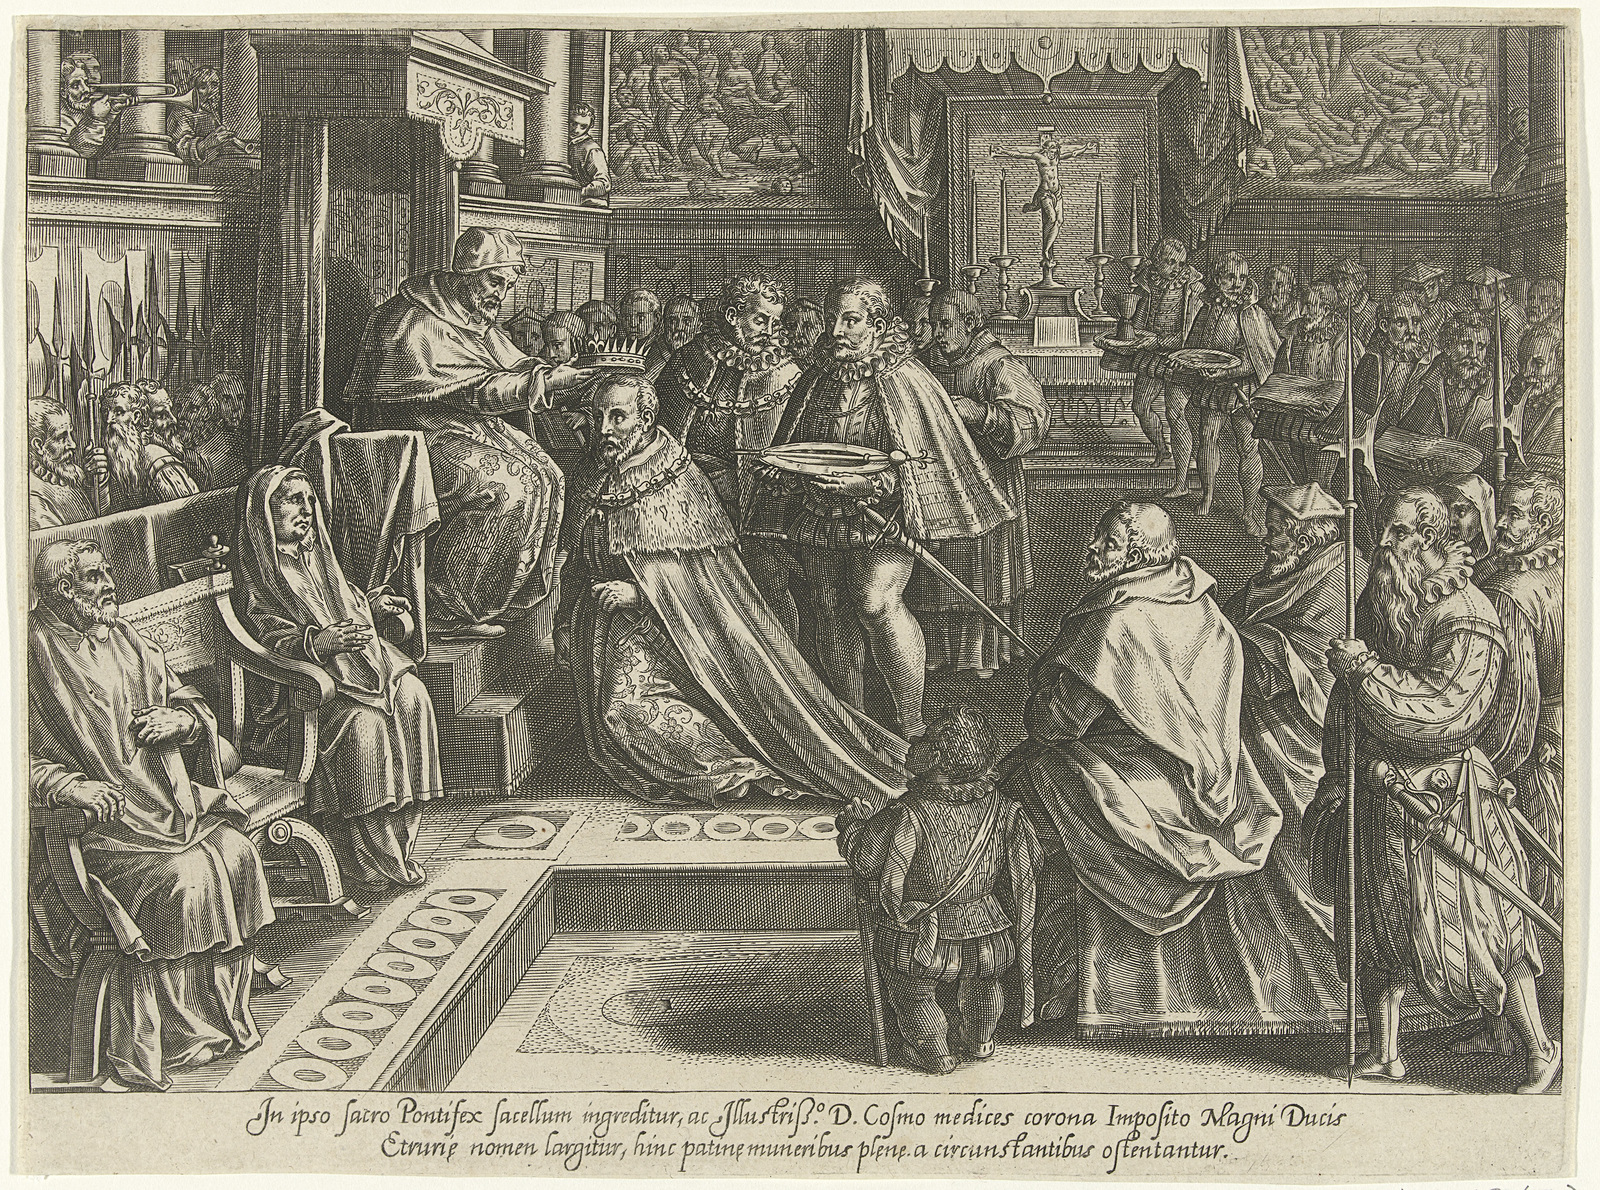 Kroning van Cosimo De' Medici in 1569